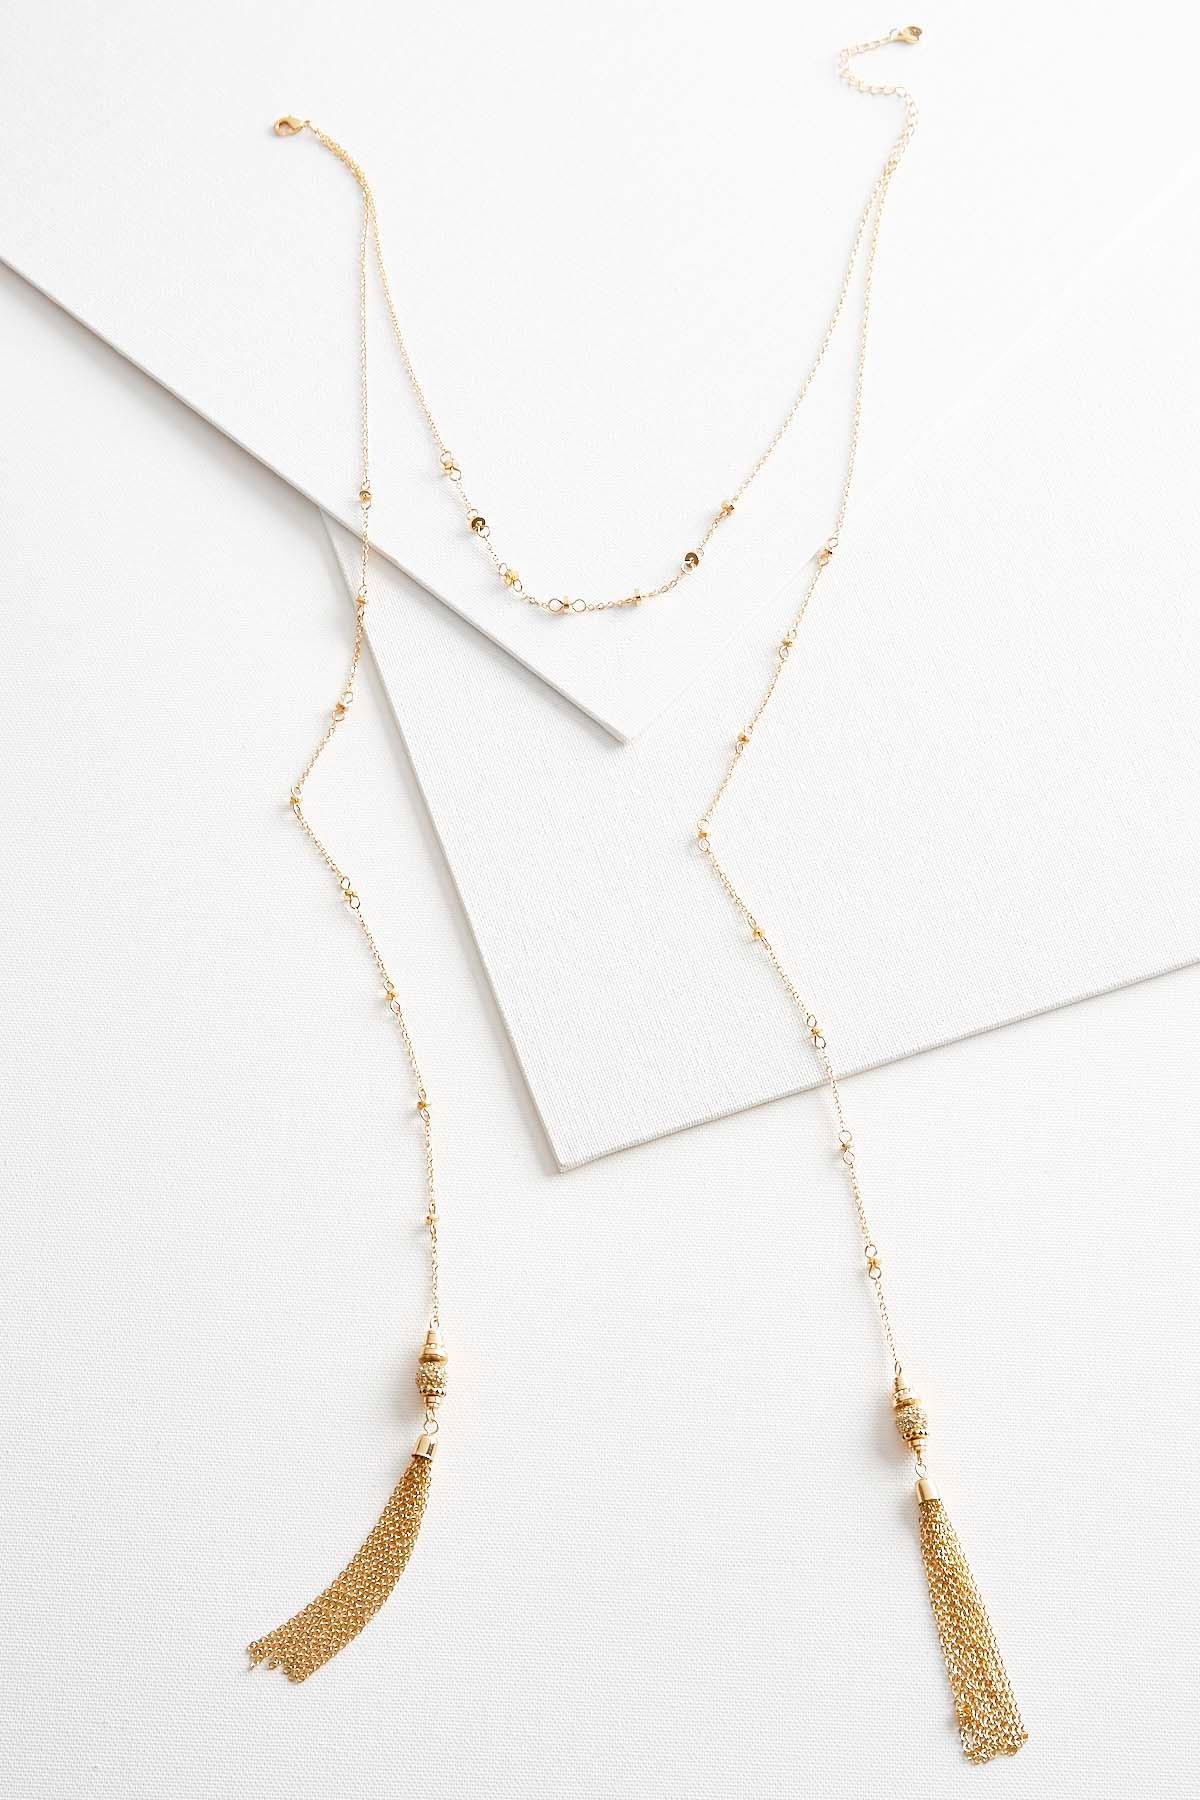 Layered Lariet Tassel Necklace